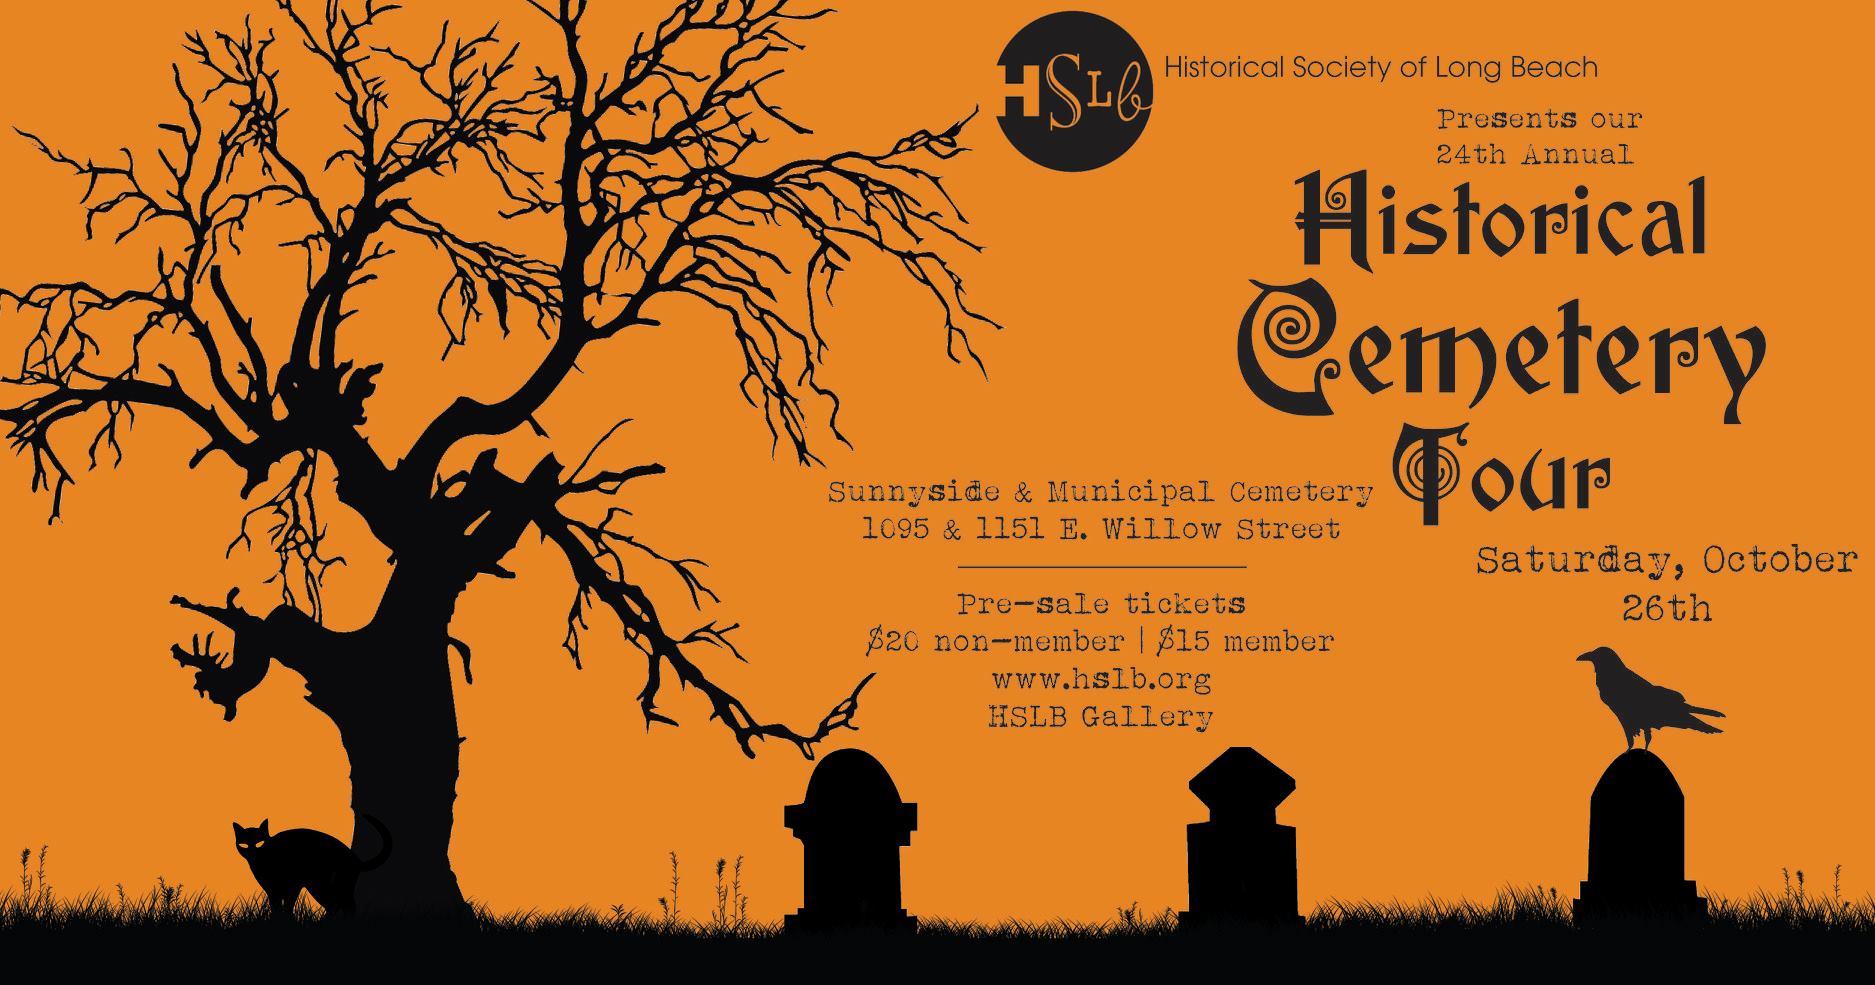 24th Annual Historical Cemetery Tour